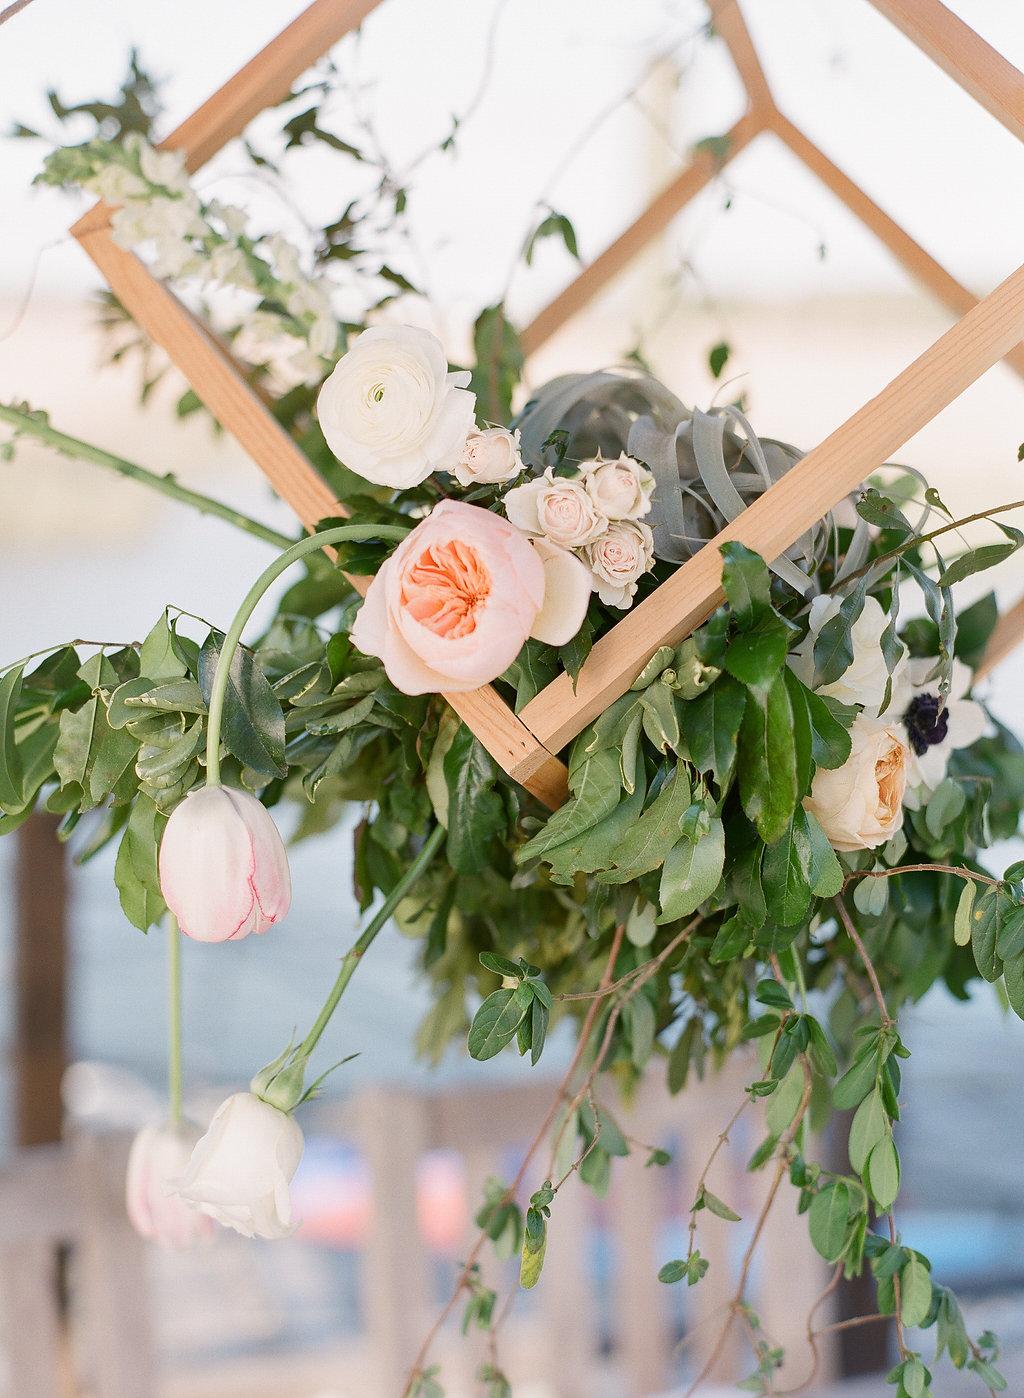 hanging-centerpiece-wedding-florist-ivory-and-beau-savannah-wedding-florist-savannah-wedding-planner-savannah-event-designer-the-wyld-dock-bar-wedding.jpg